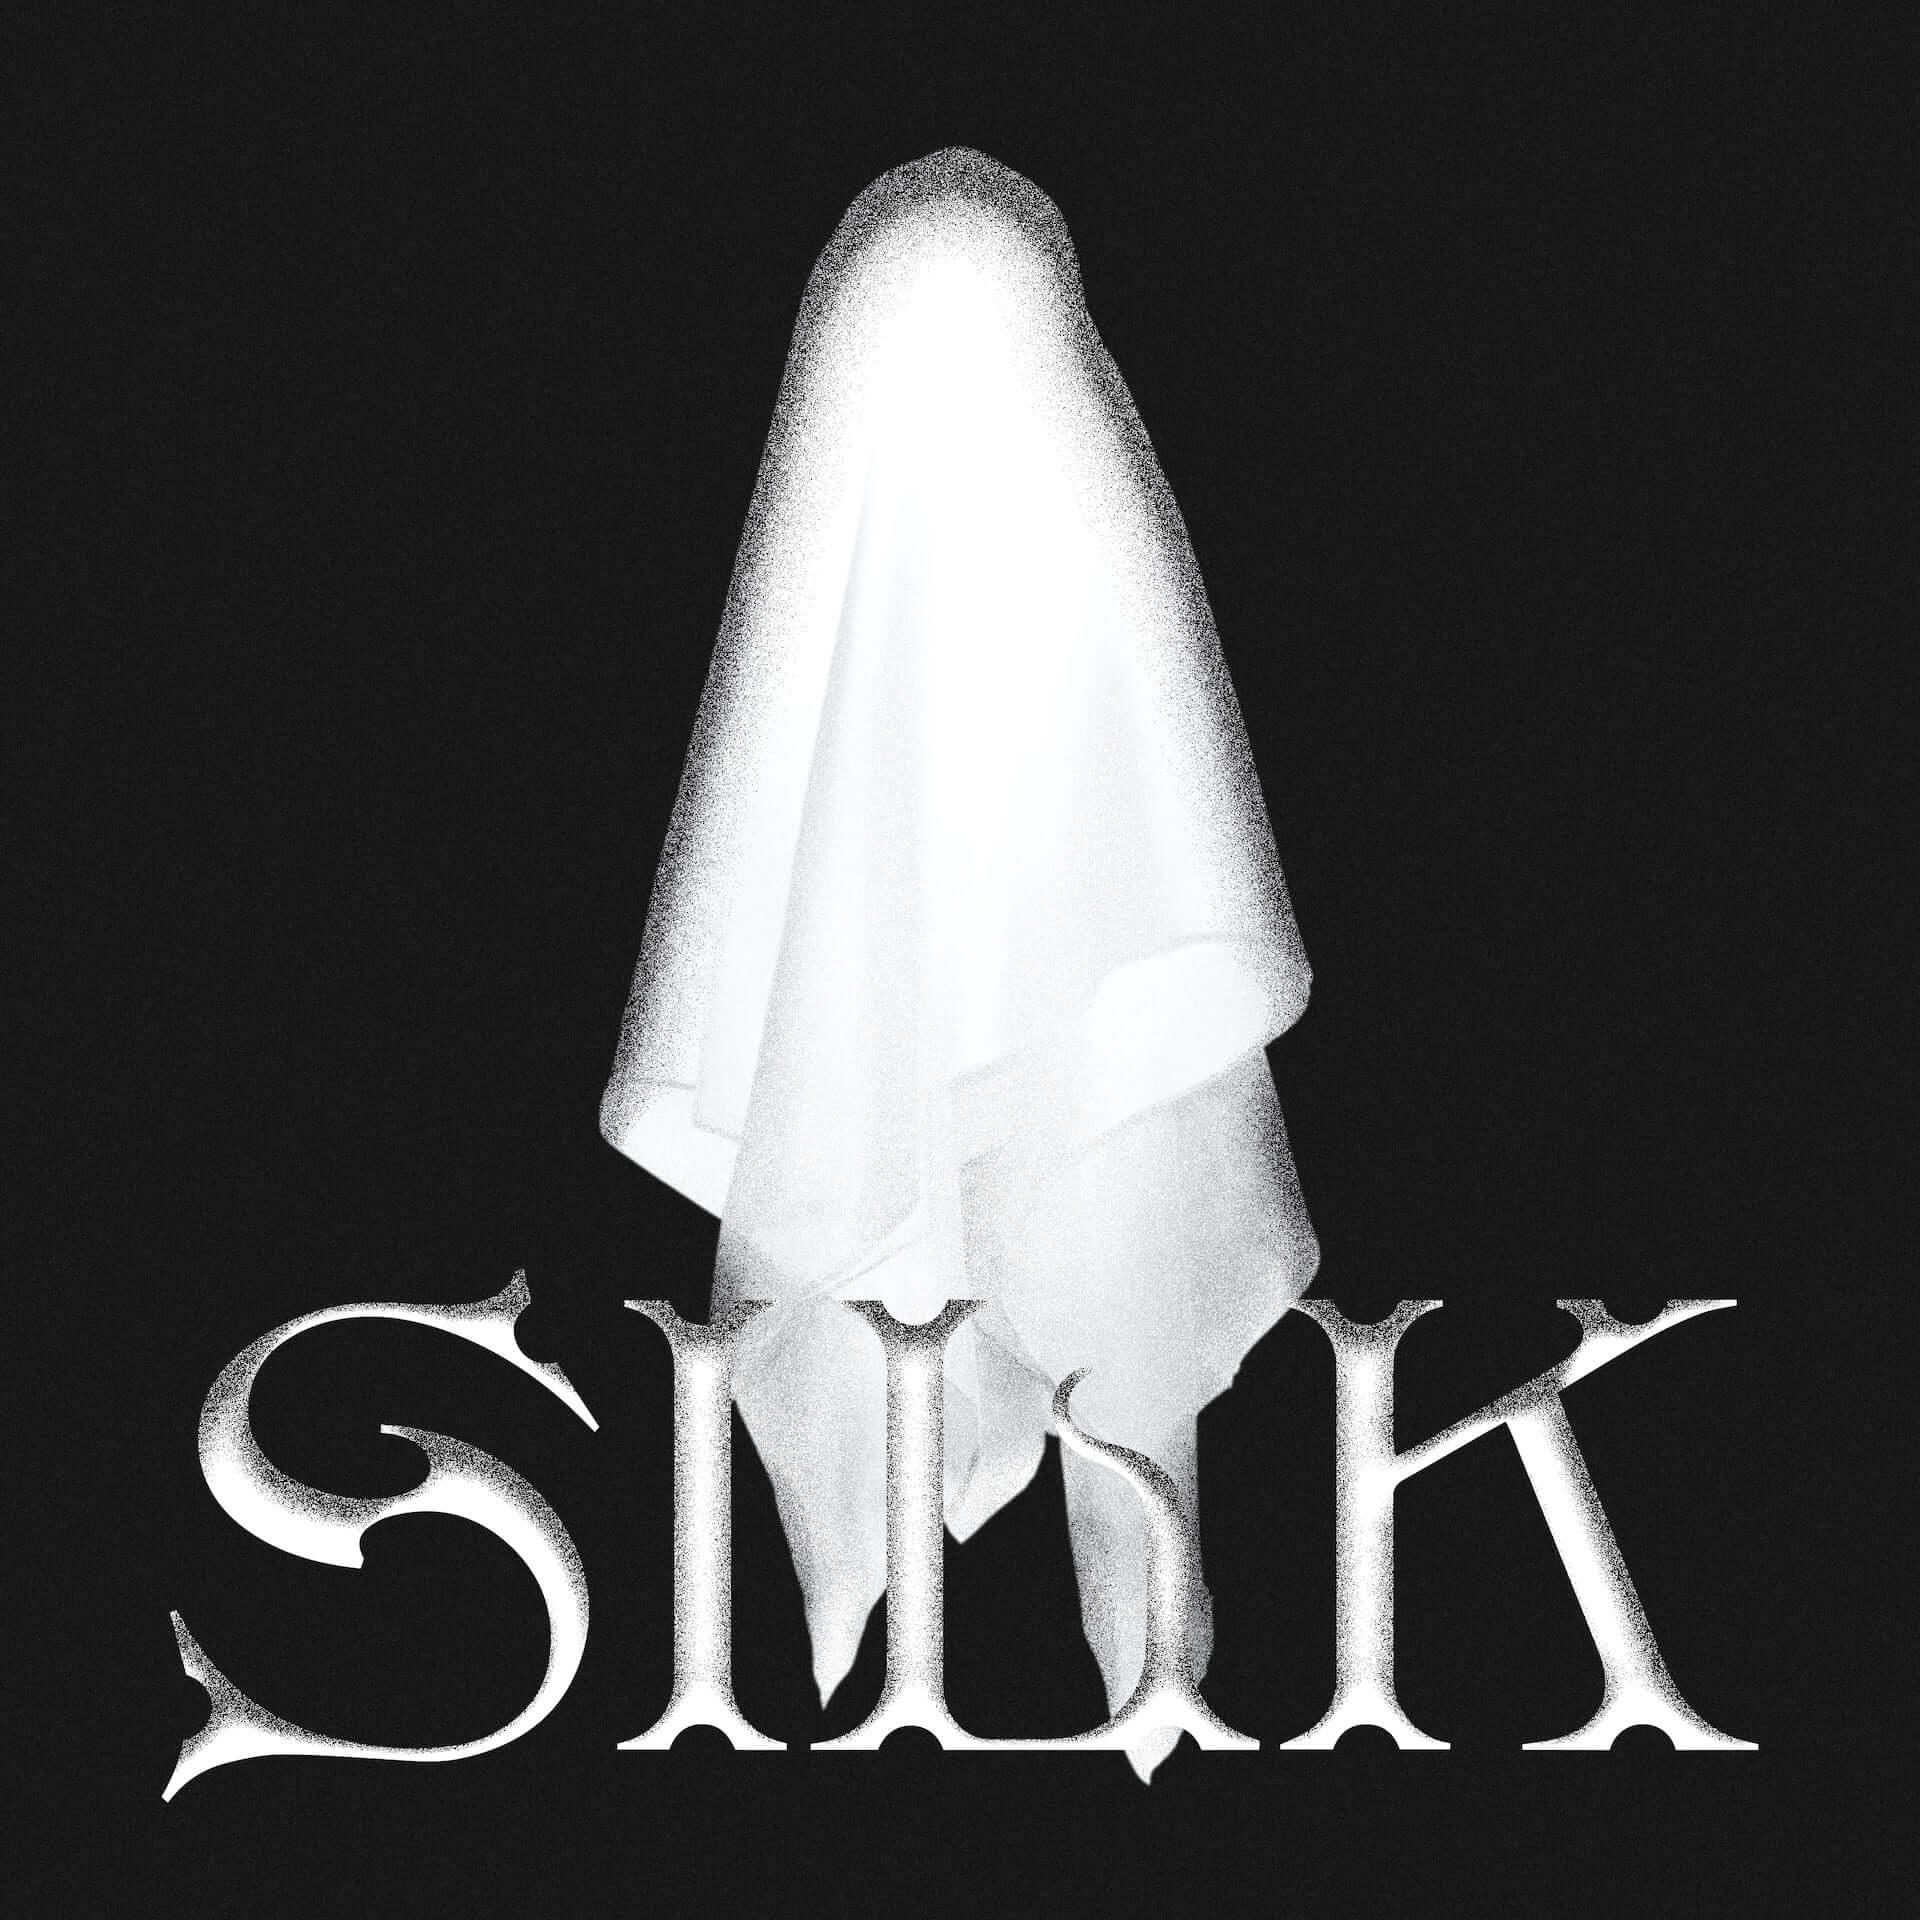 "Black Boboiの1stアルバム『SILK』がついに本日リリース!新曲""gd612""のMVも公開 music201125_blackboboi_1-1920x1920"